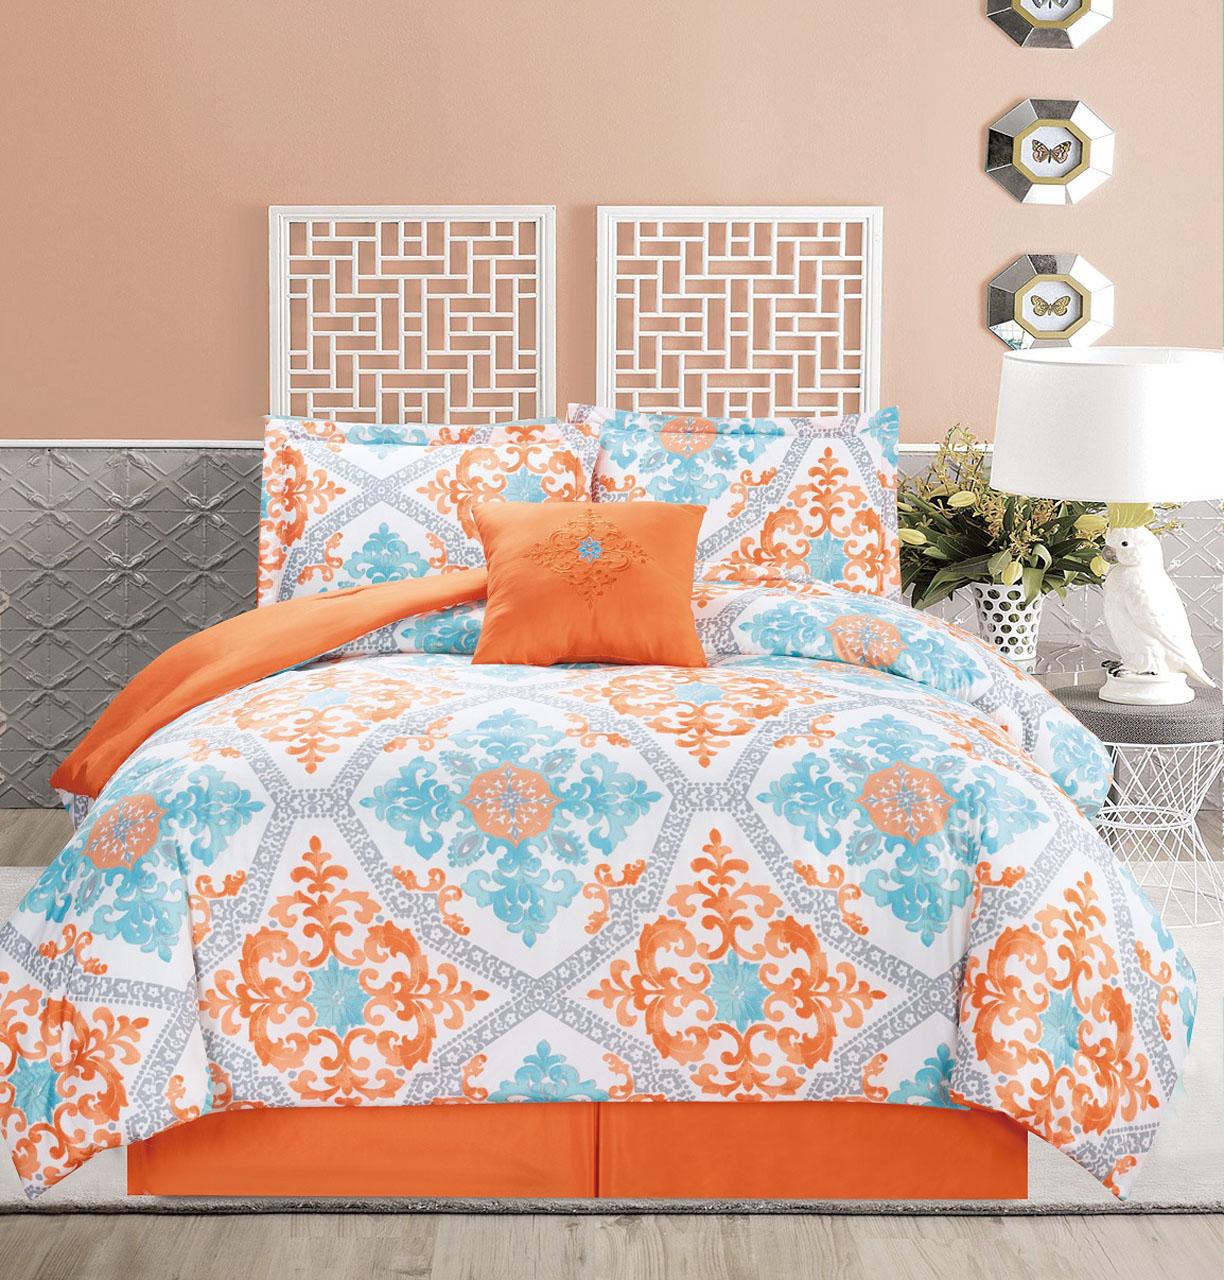 5 Piece Regal Orange/Blue/White Comforter Set